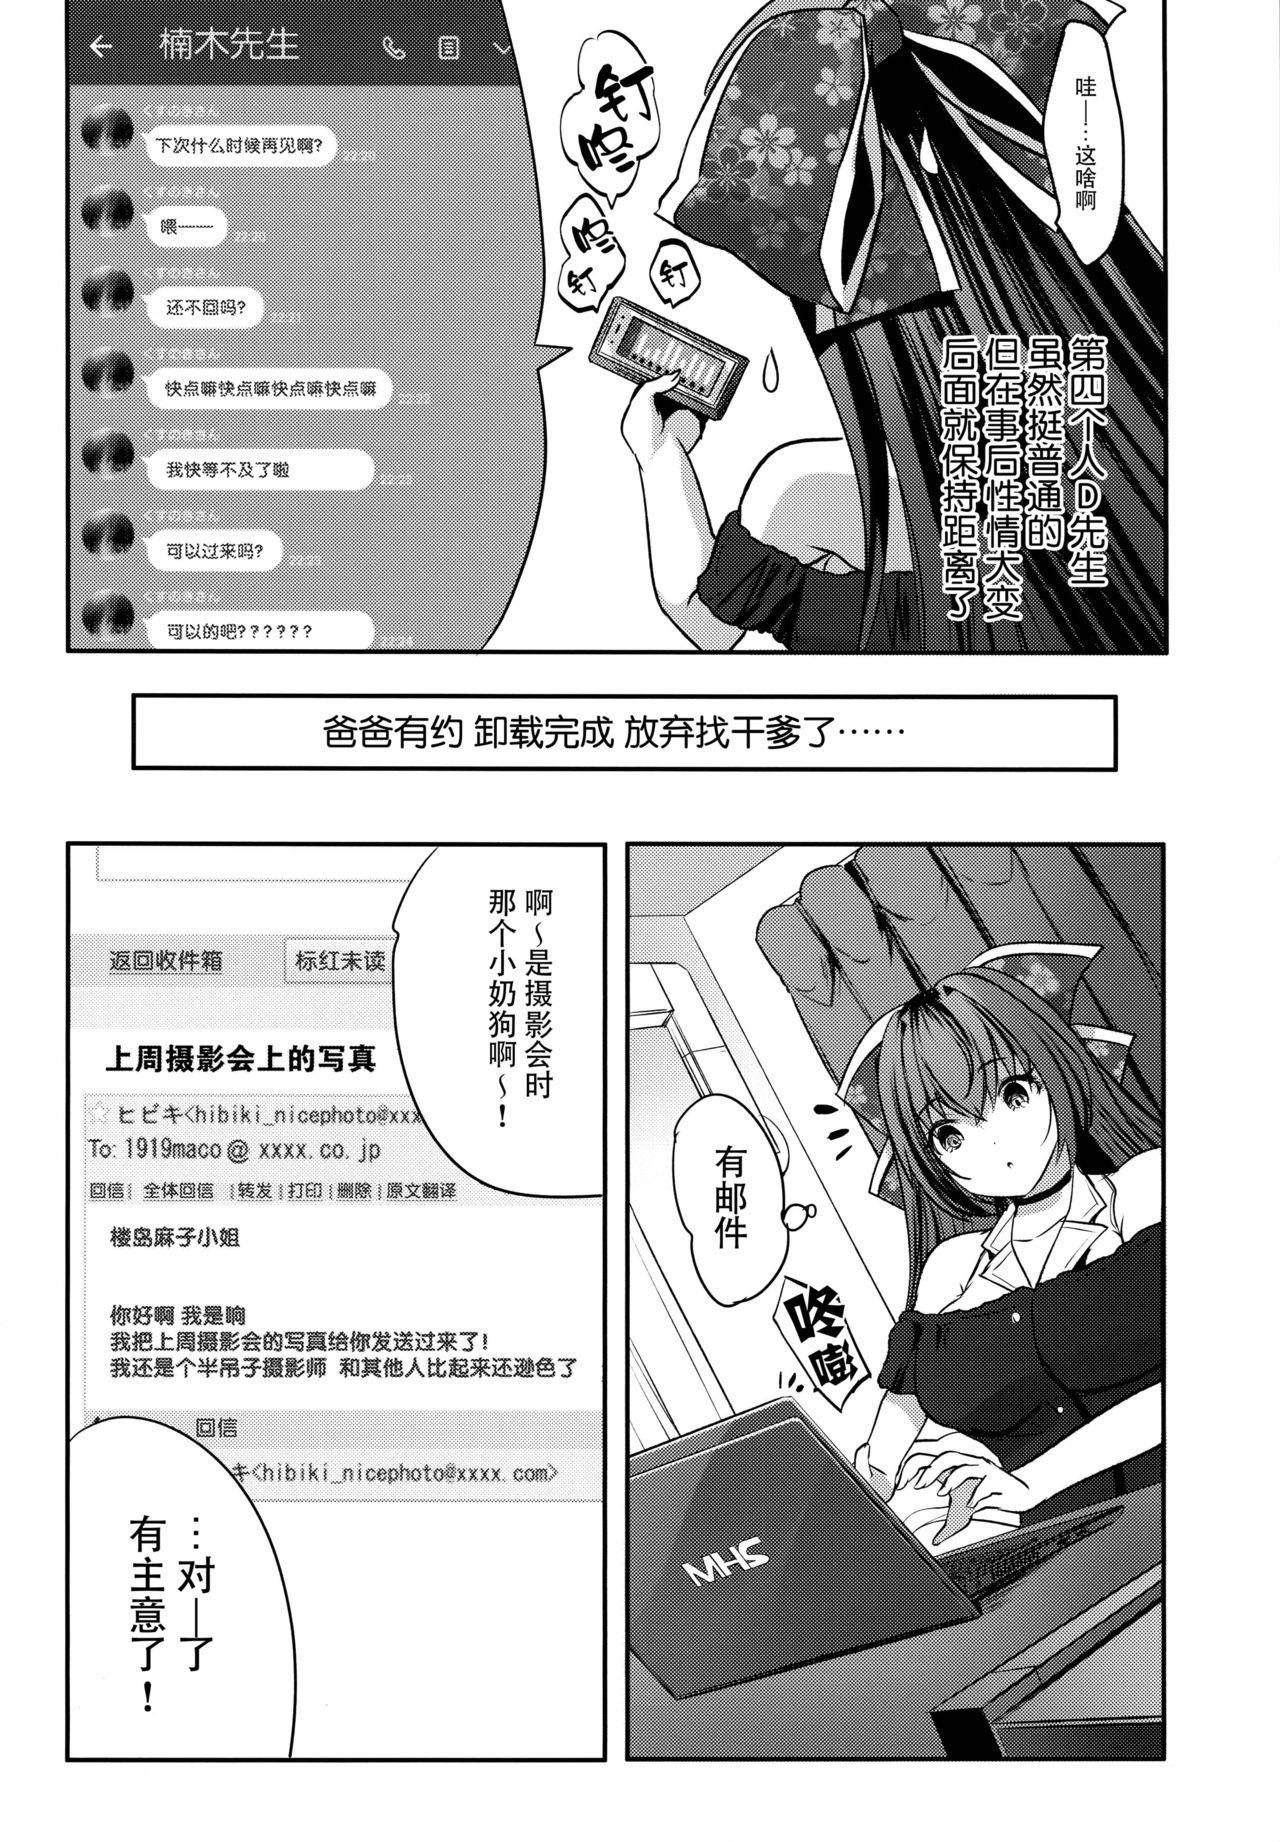 Roujima Mako no Ecchi na Aikata Boshuuchuu! 11